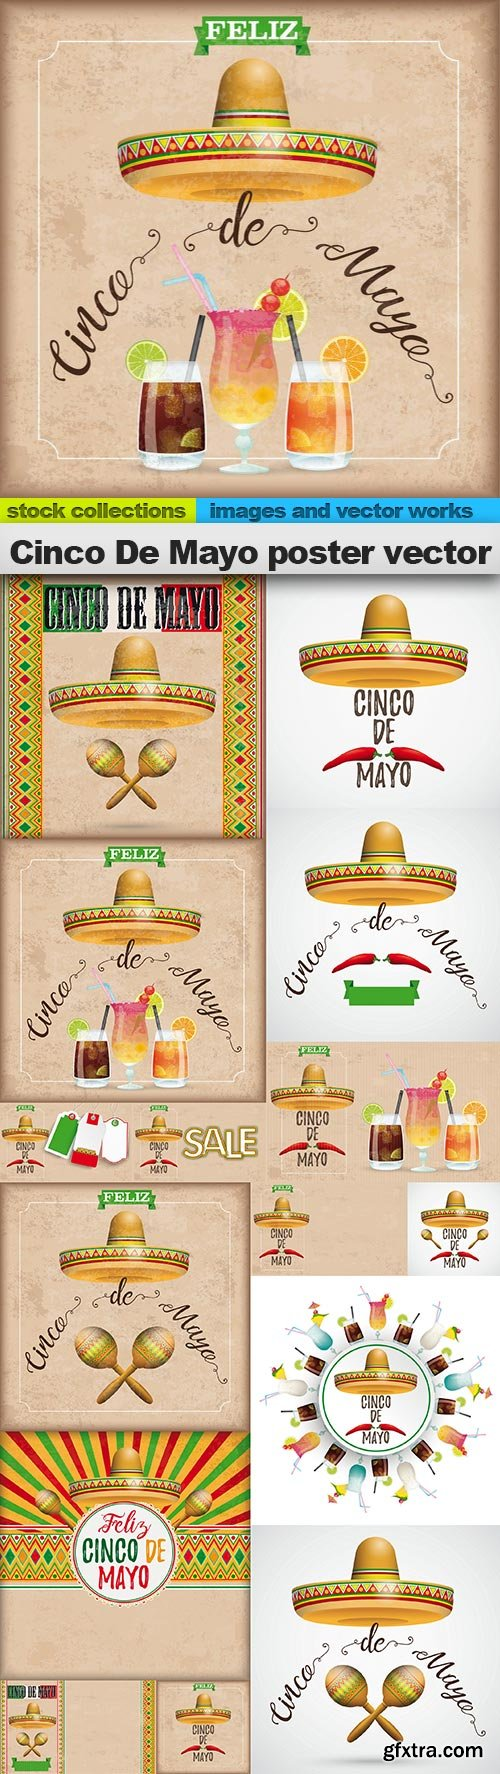 Cinco De Mayo poster vector, 15 x EPS